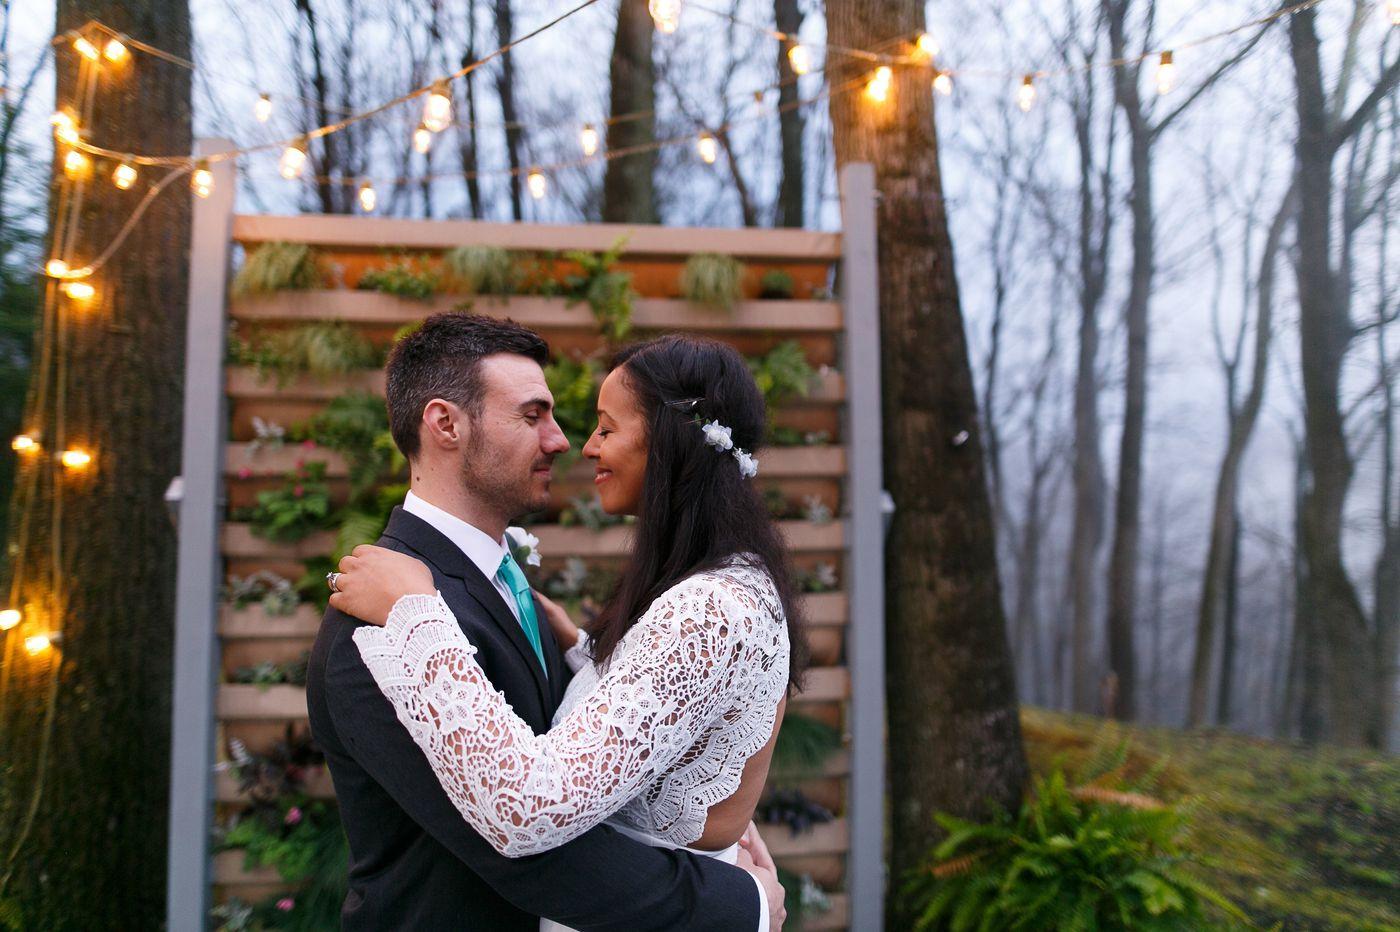 Philadelphia weddings: Ashley Carnes-Carelock and Nicholas Lucente